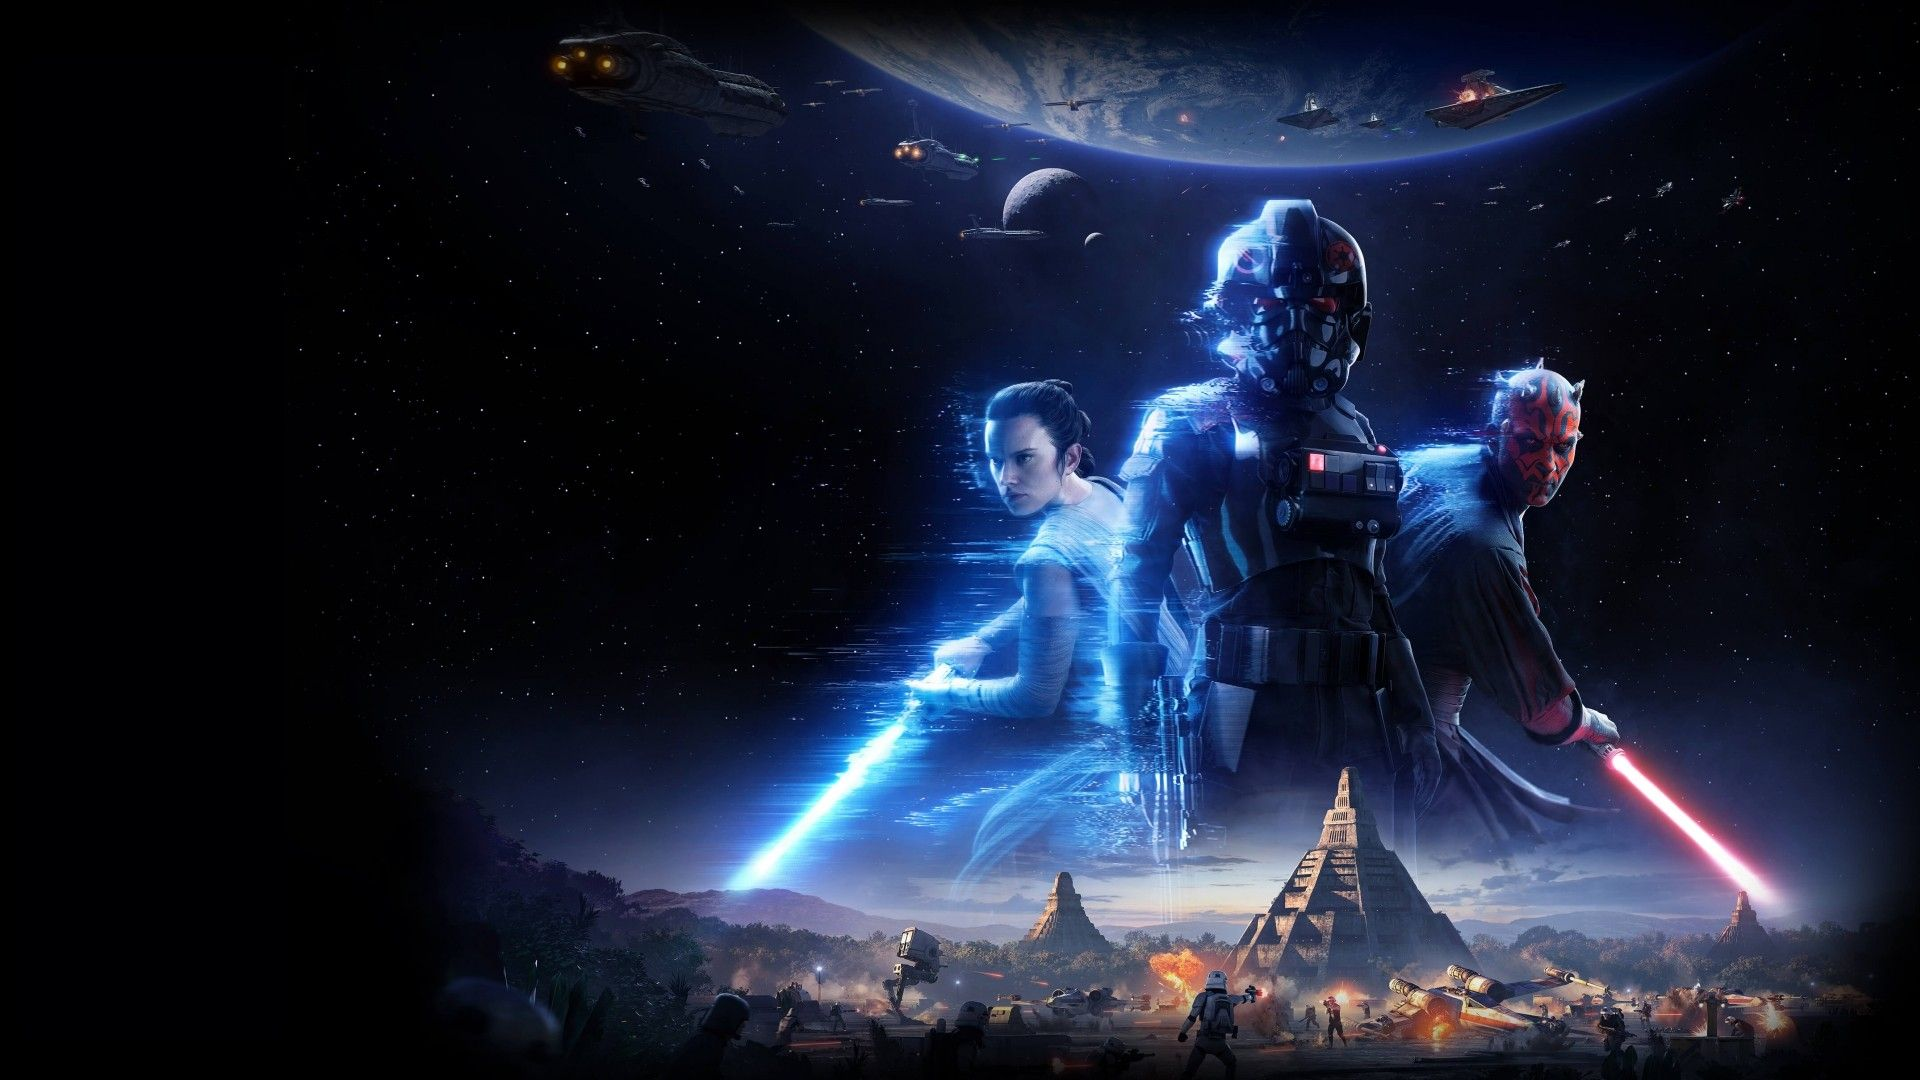 Star Wars Battlefront 2 Wallpaper 1920x1080